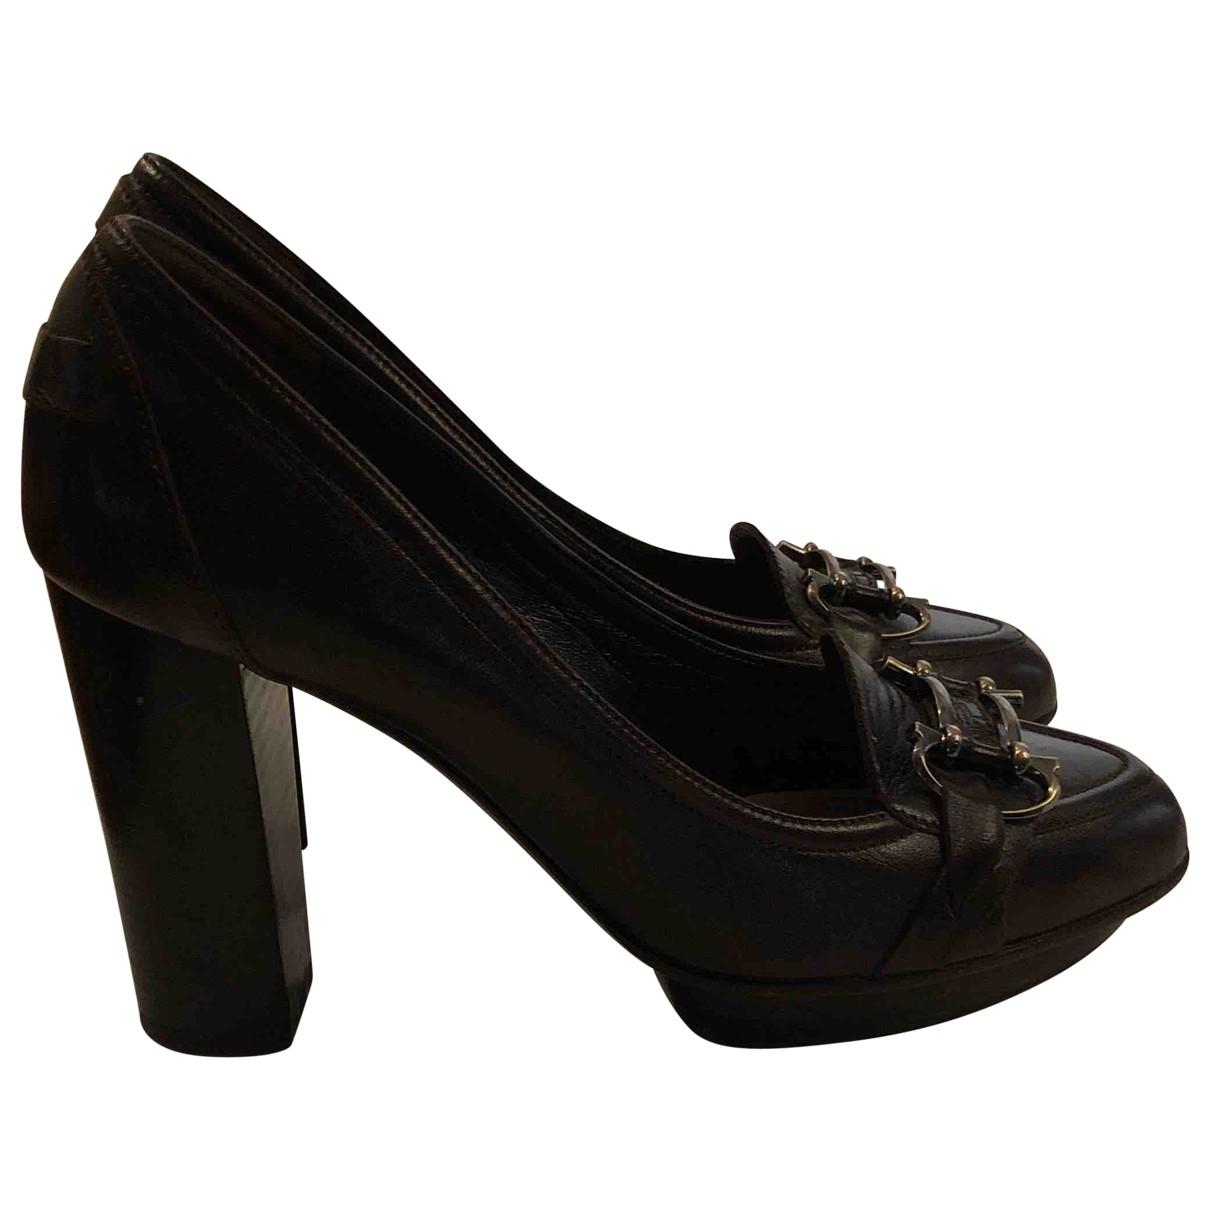 Salvatore Ferragamo \N Brown Leather Heels for Women 39 EU